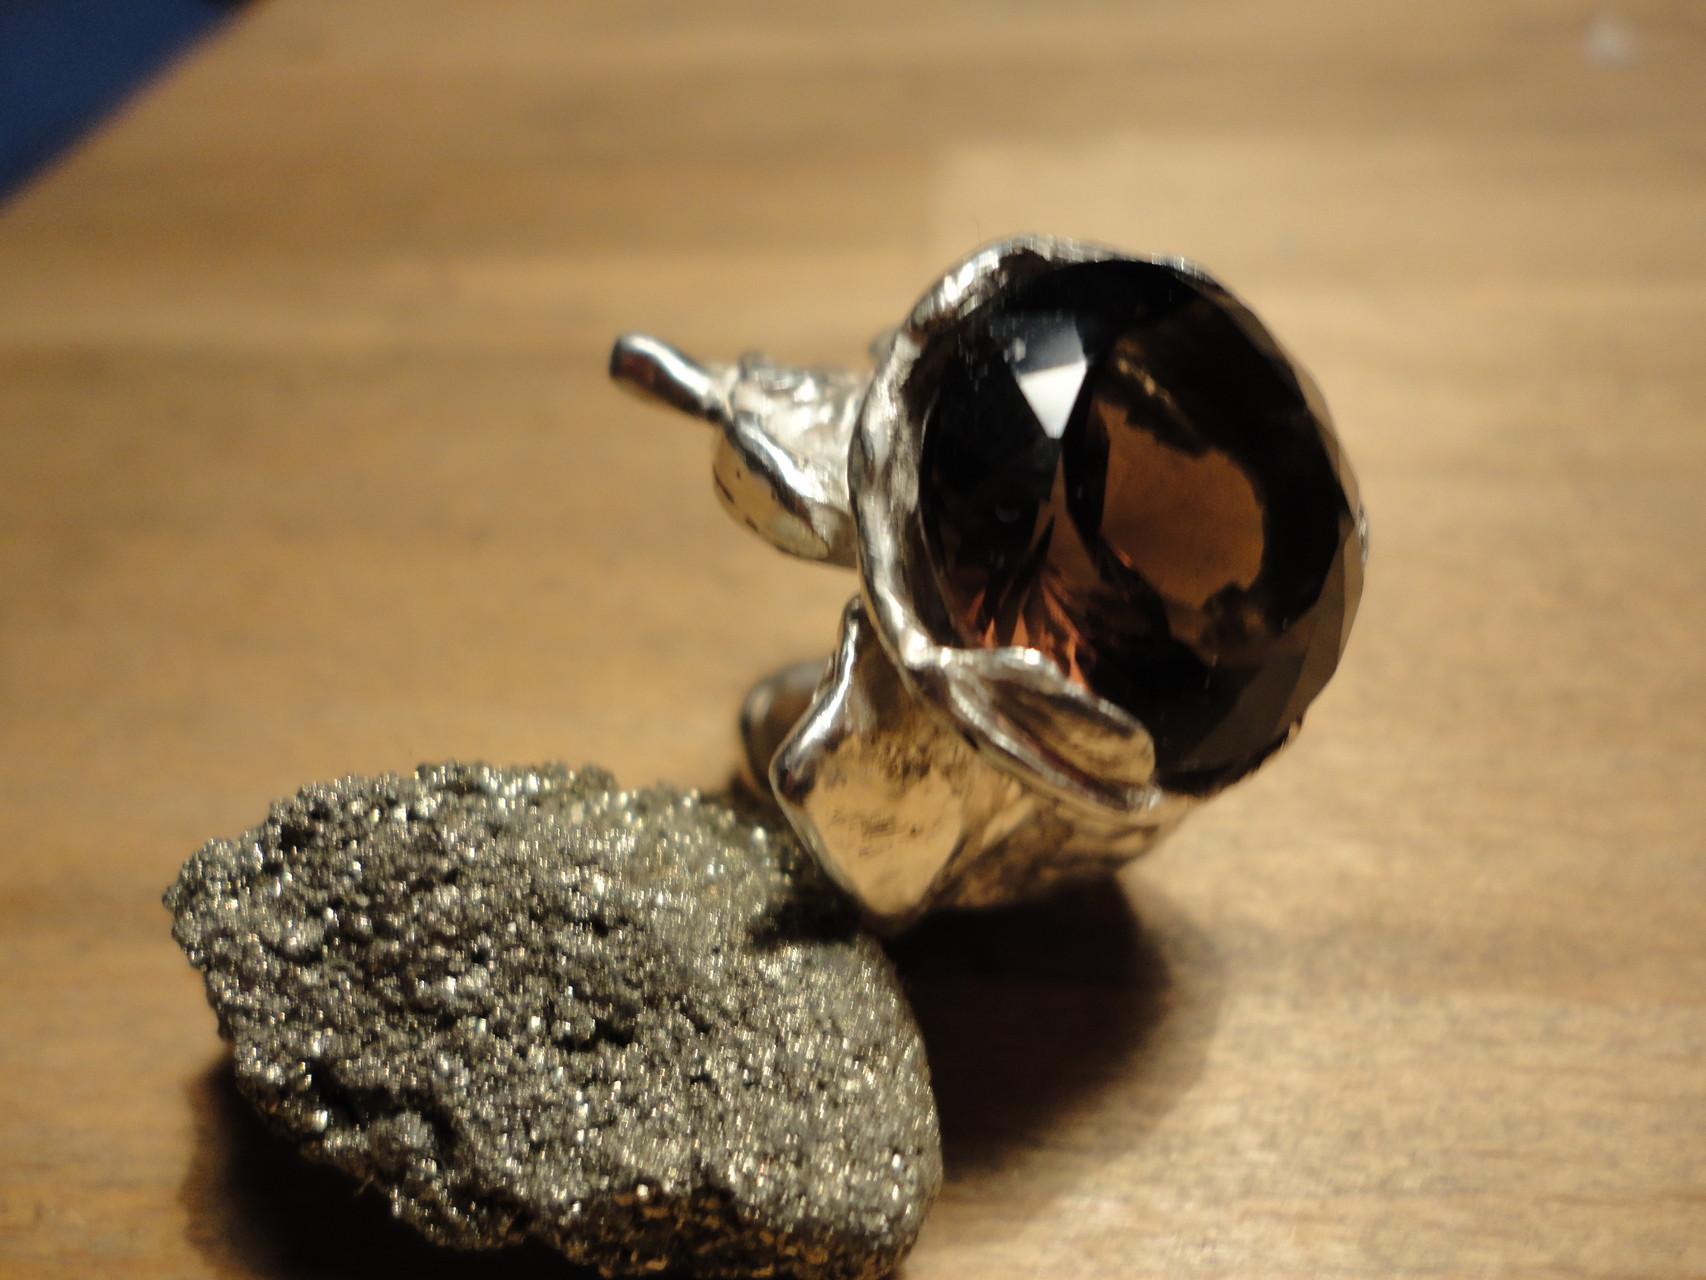 Silber-Nugget-Ring mit grossem Rauchquarz (925 Sterlingsilber) Preis: CHF 320.-